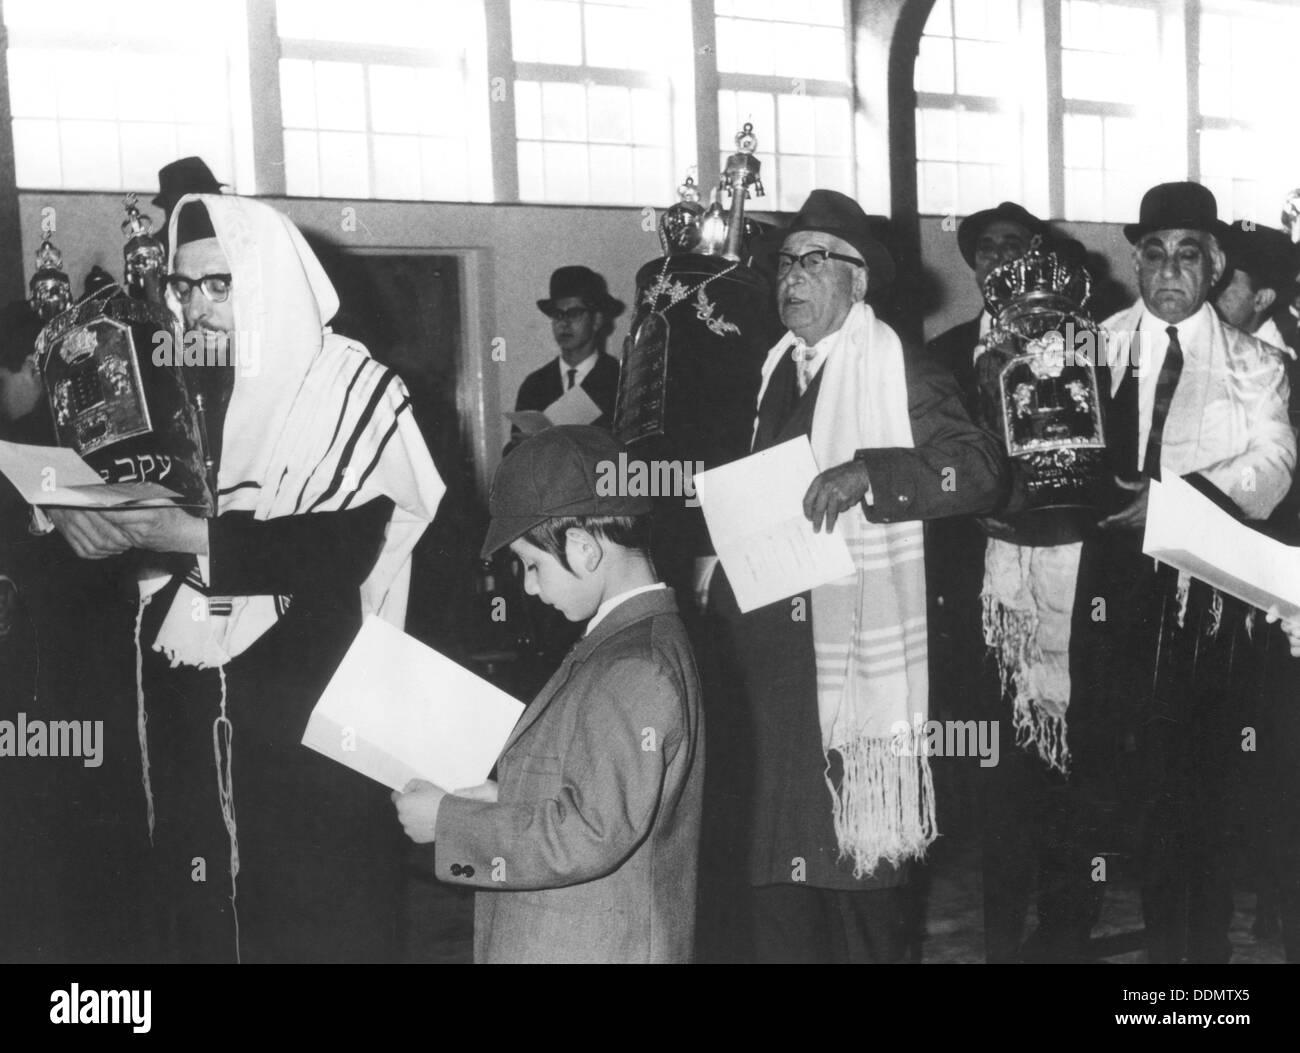 Sephardic Jews, 1965. - Stock Image